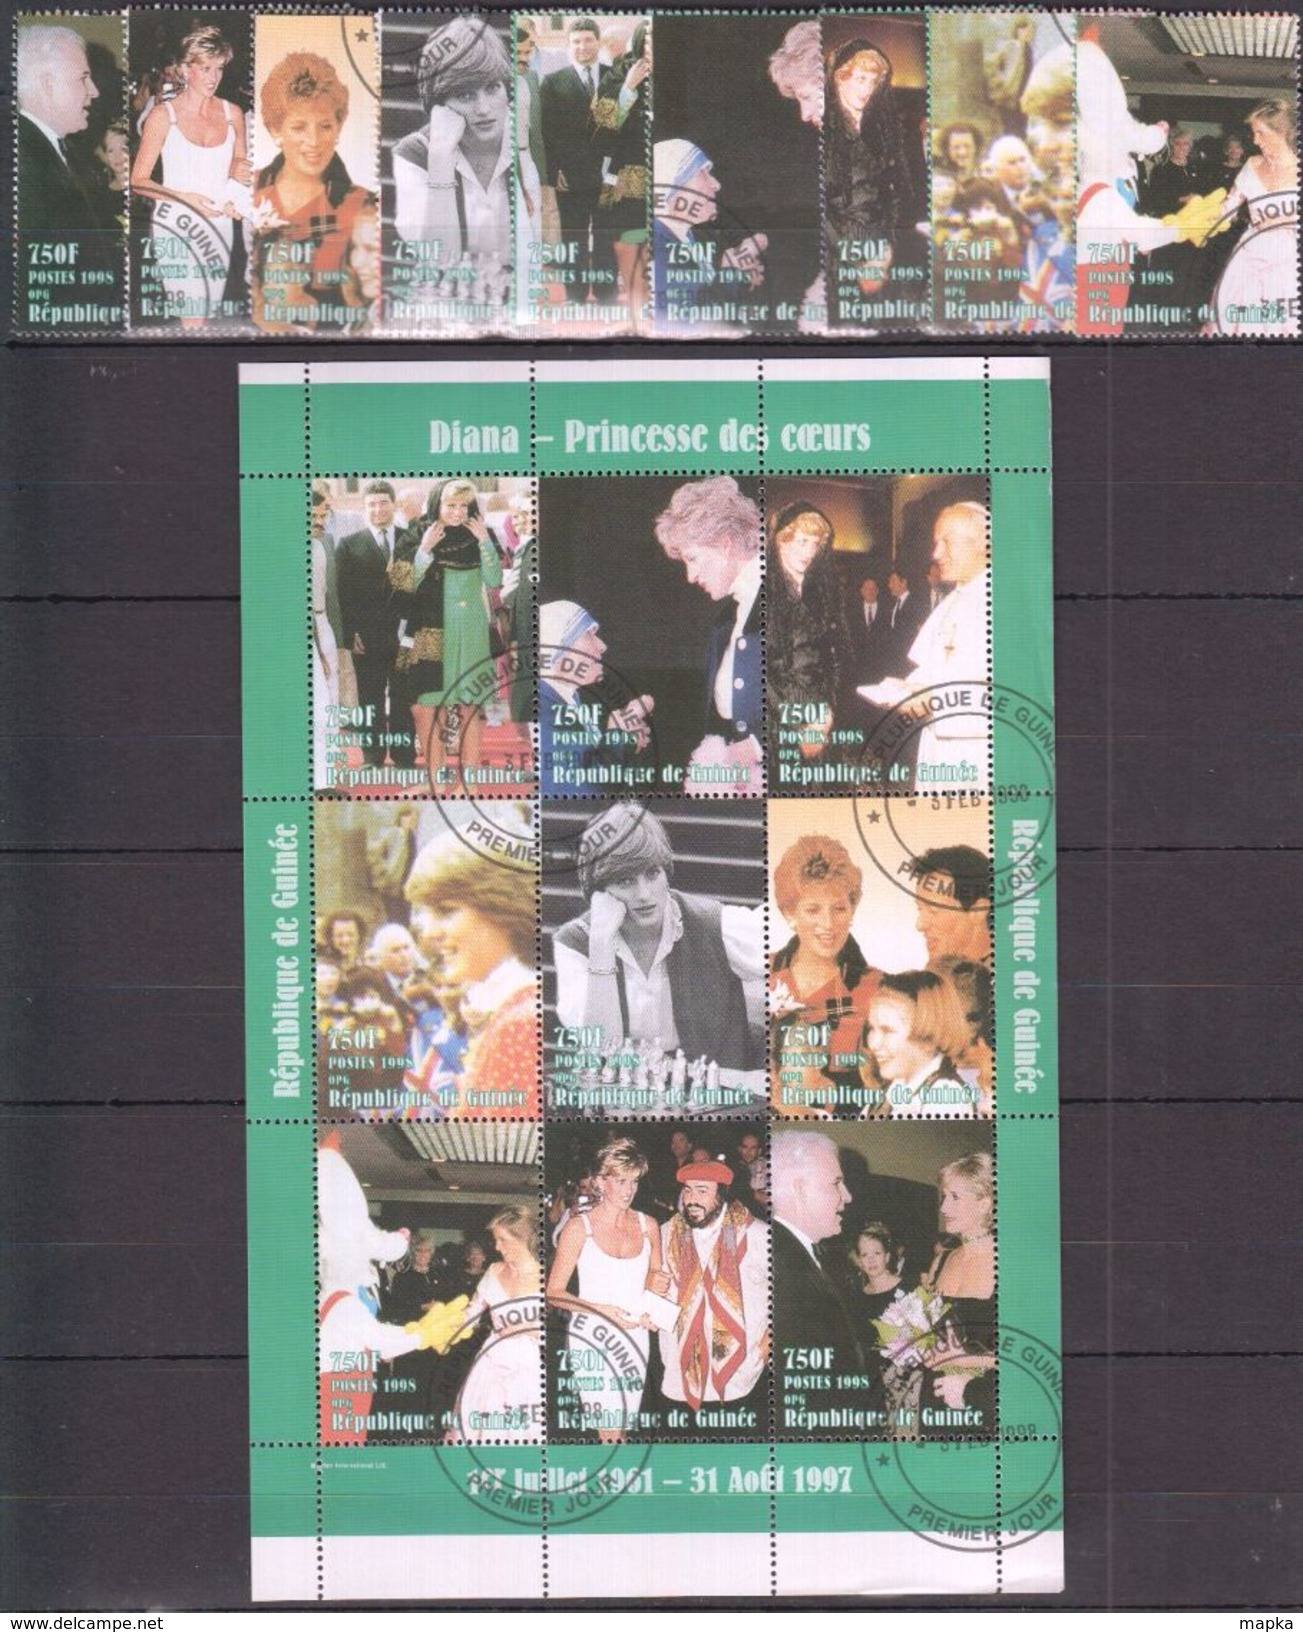 J672 1998 DE GUINEE FAMOUS PEOPLE ROYALTY PRINCESS DIANA 1KB+1SET USED - Familles Royales